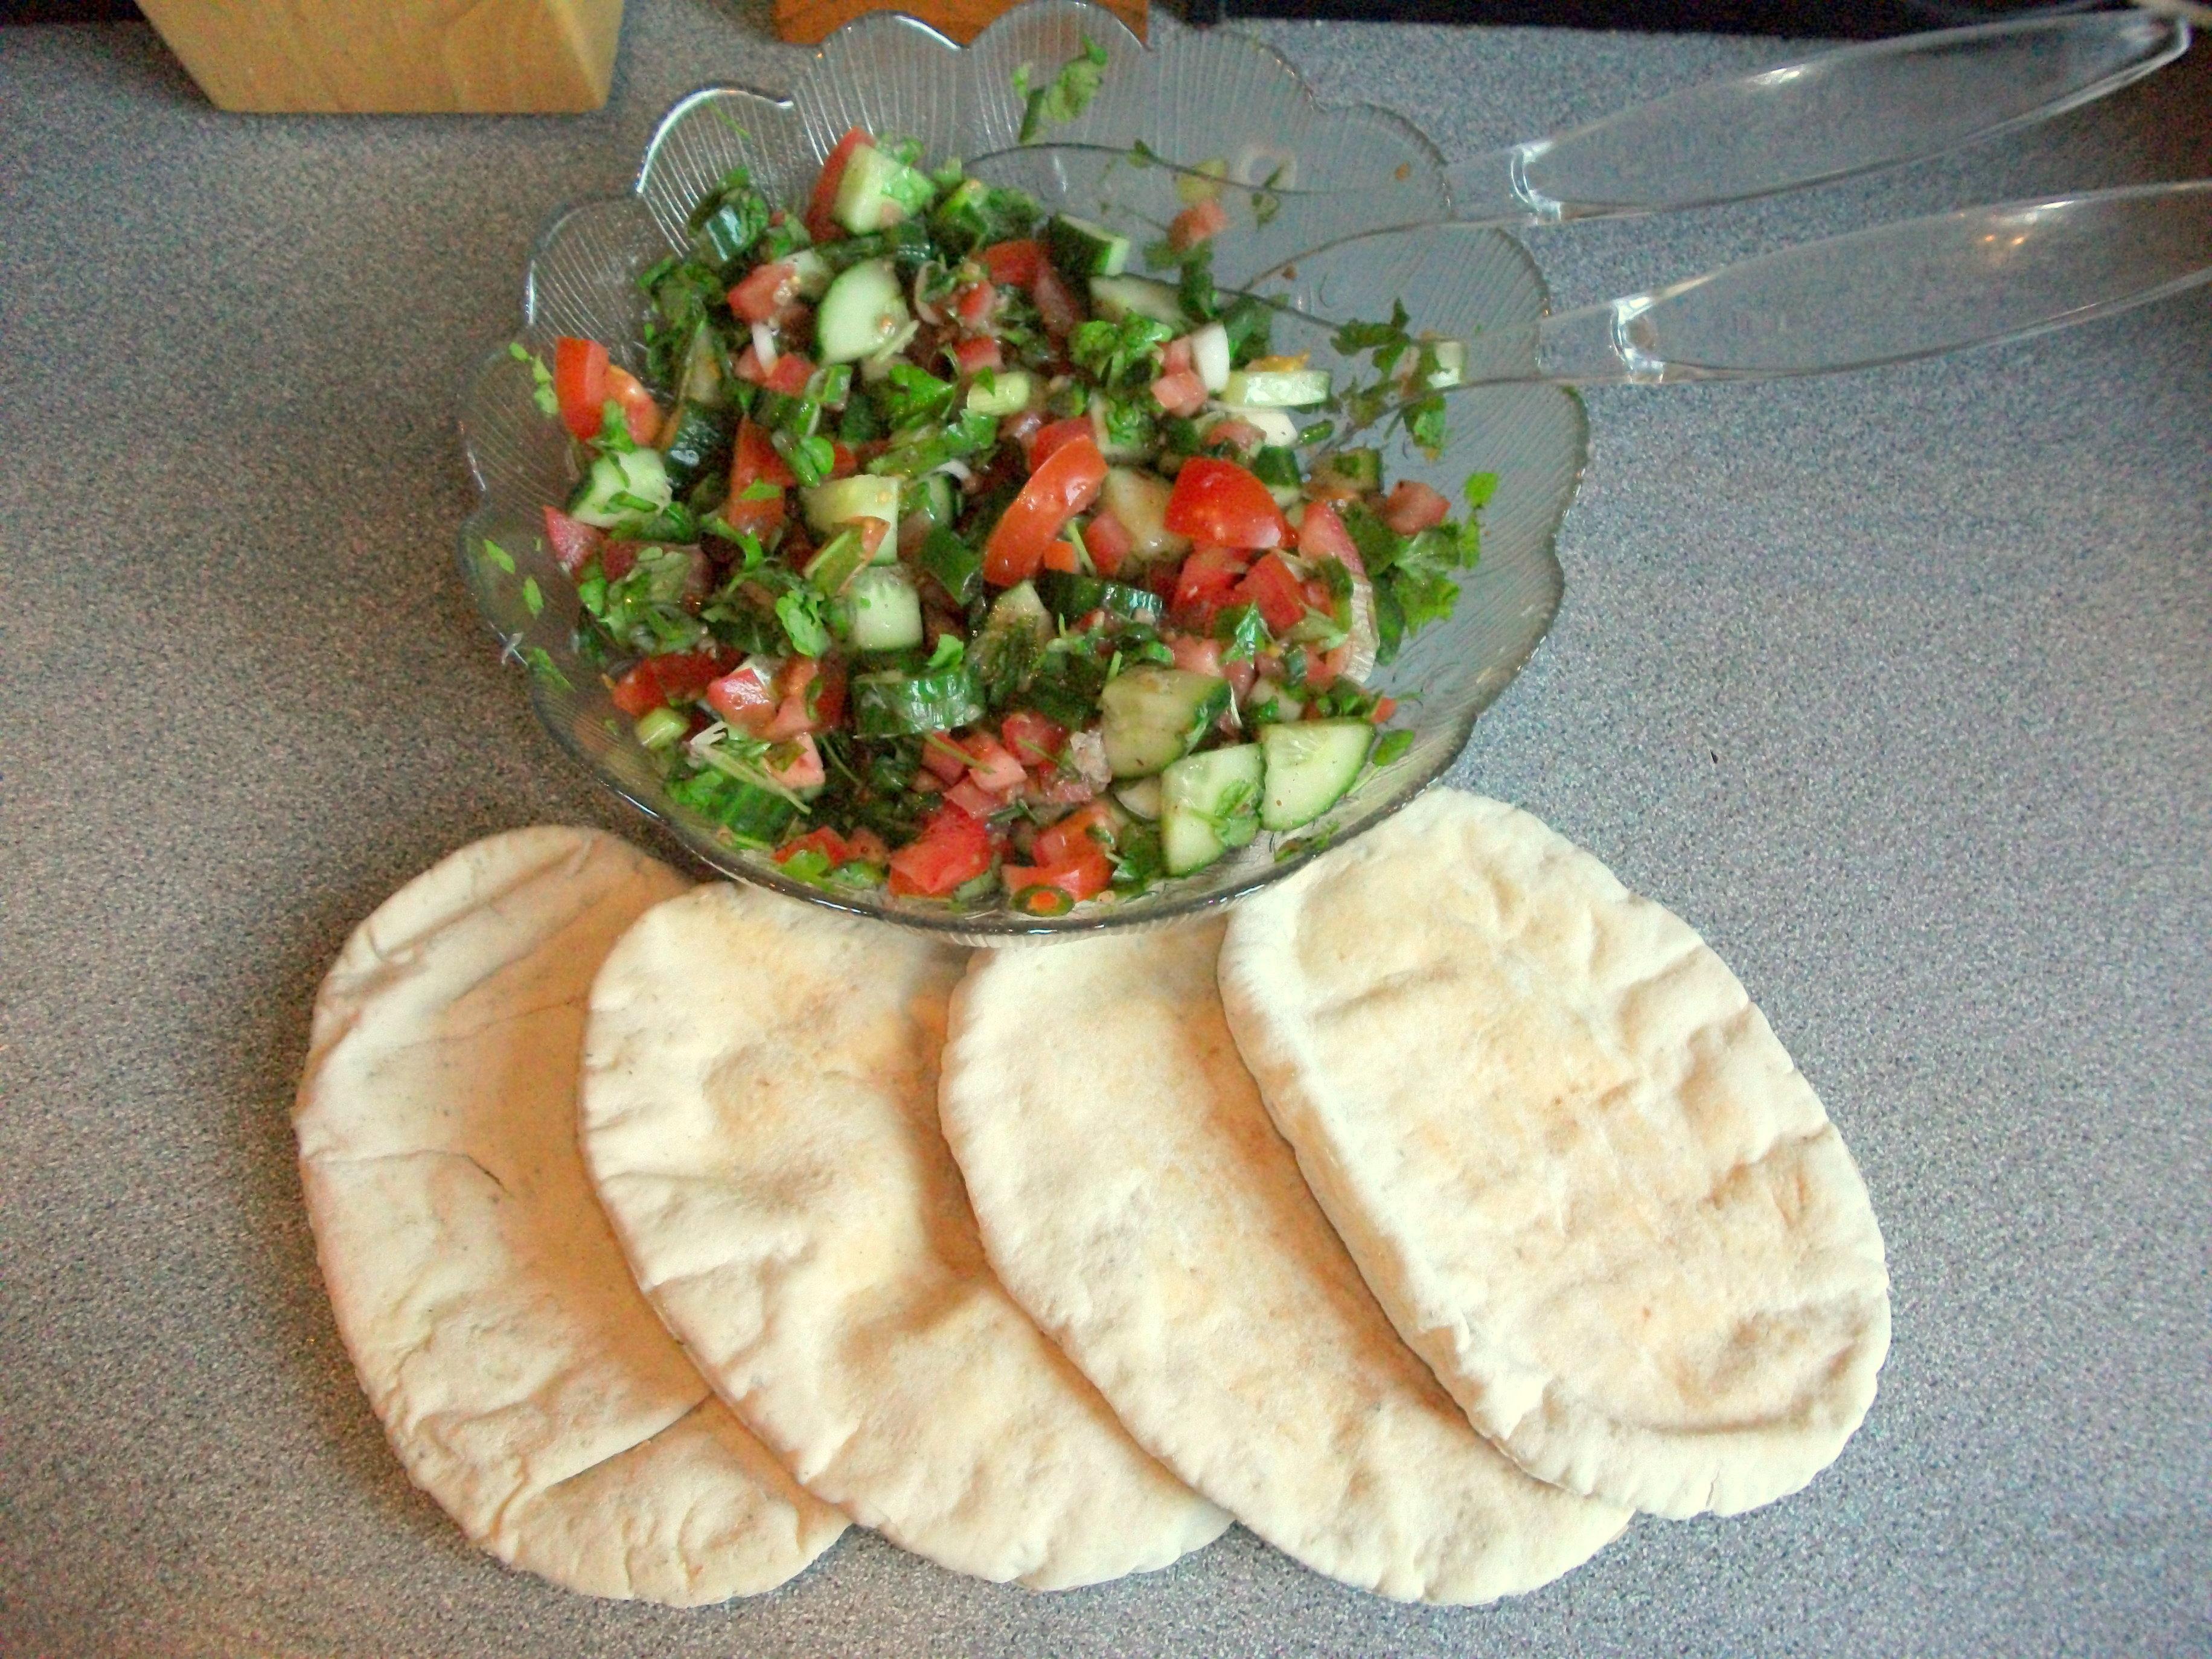 Fatoush - A zesty middle-eastern salad